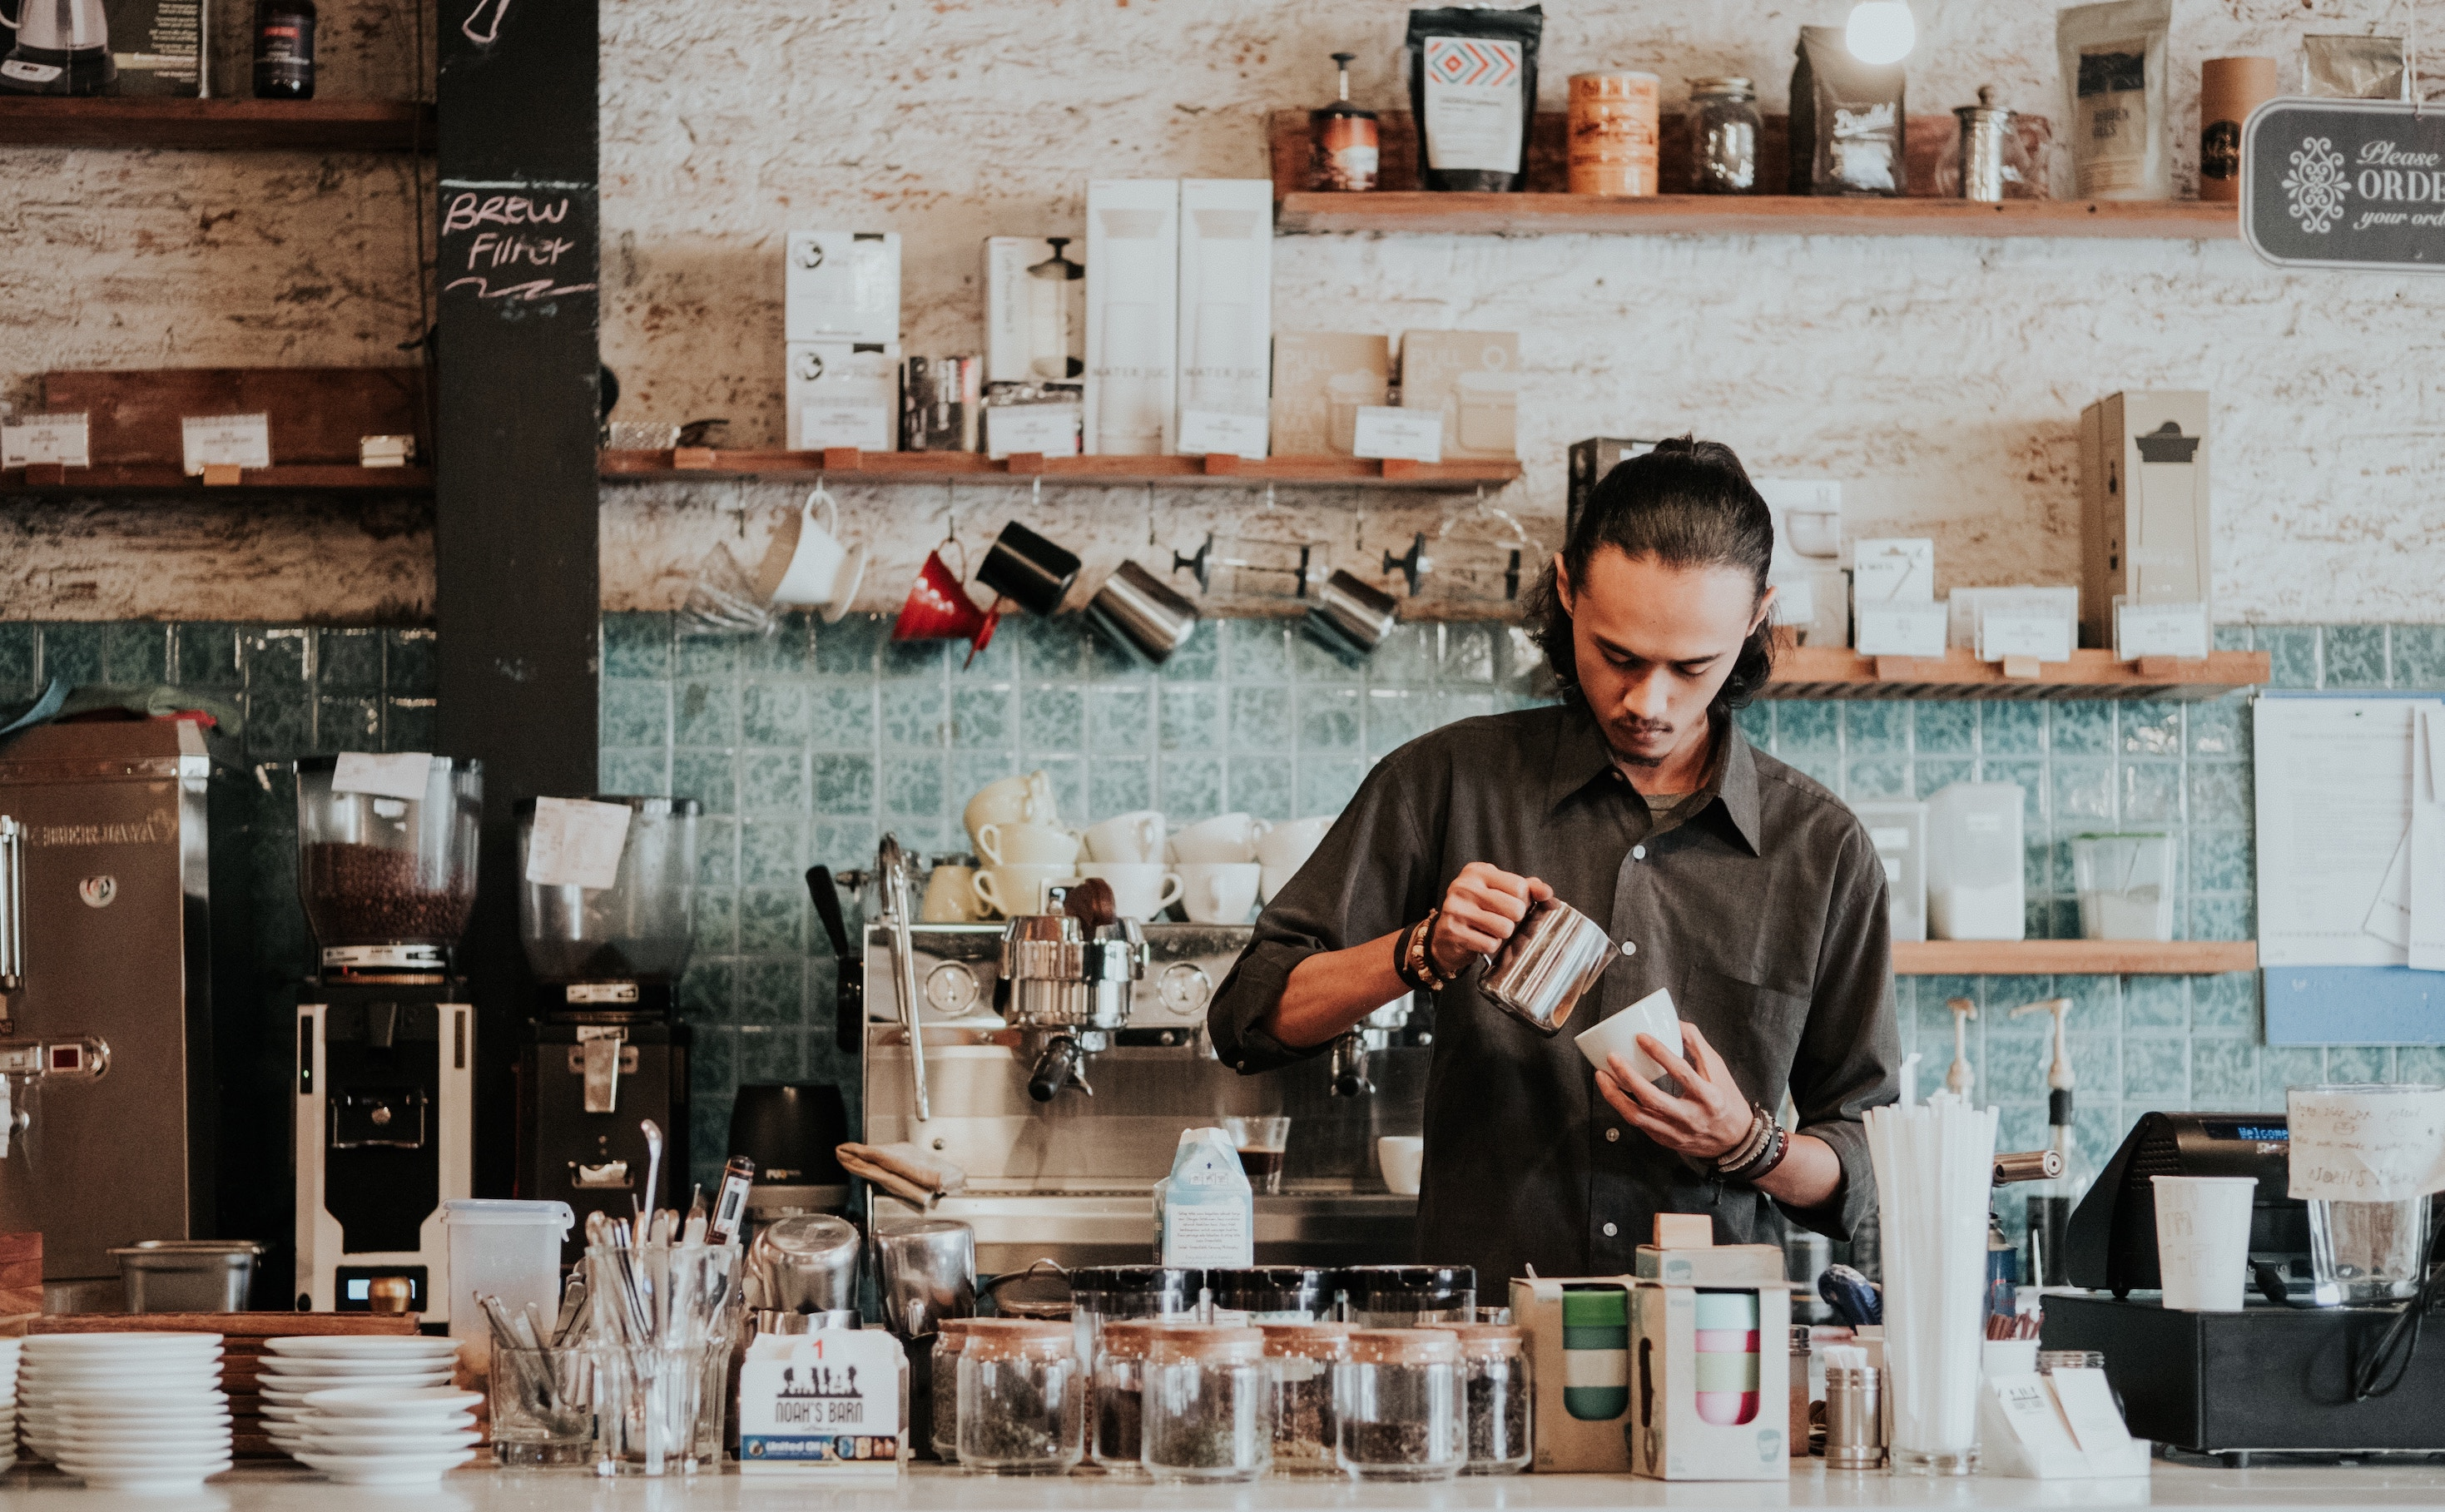 Man in a coffee shop making coffee